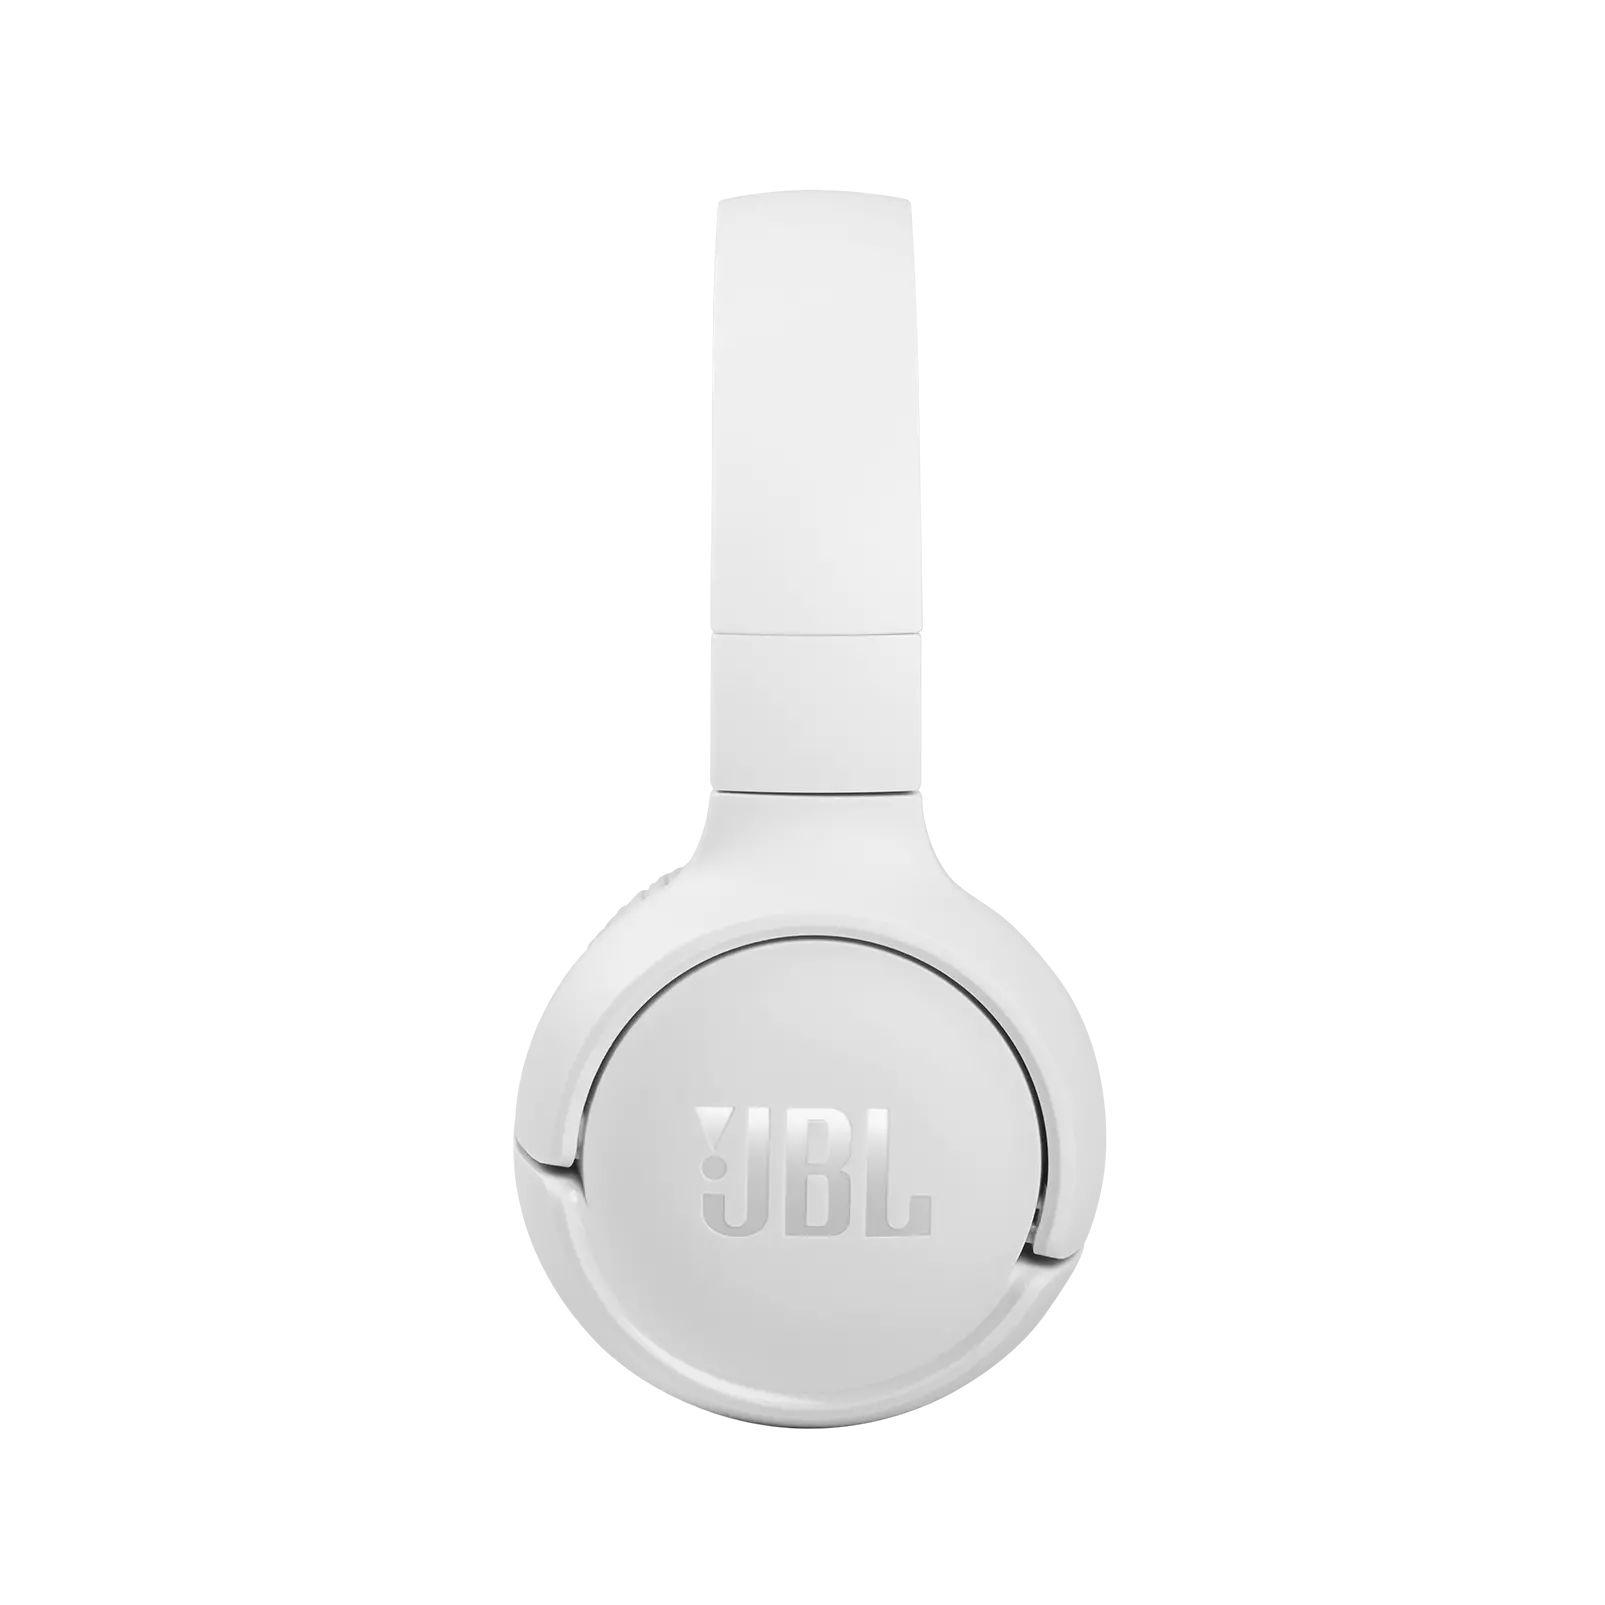 Fone de Ouvido Bluetooth JBL Tune 510BT - Branco JBLT510BTWHT